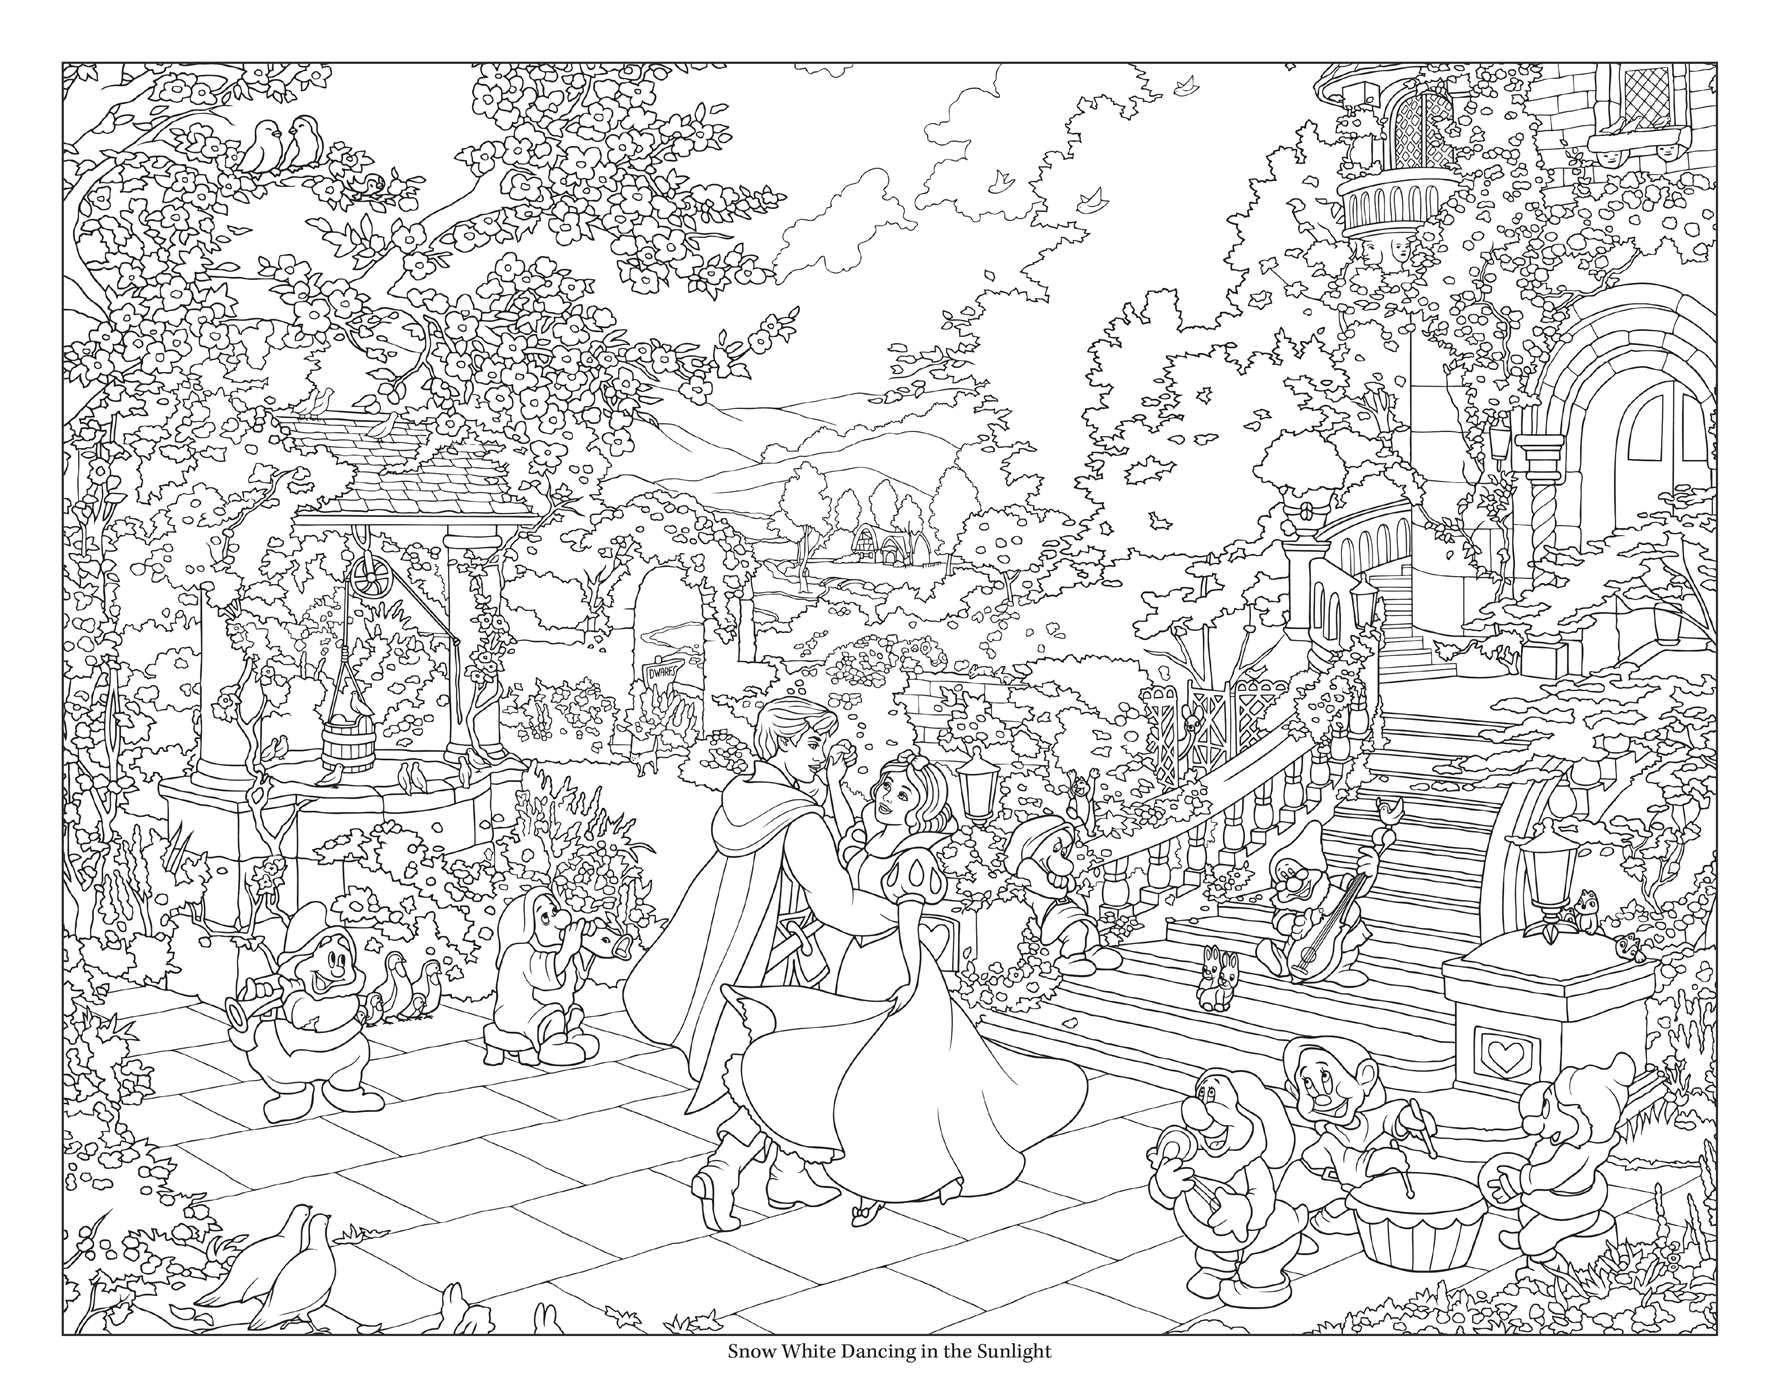 Amazon.com: Disney Dreams Collection Thomas Kinkade Studios Disney Princess  Coloring Poster Book (0050837423923): Kinkade, Thomas: Books